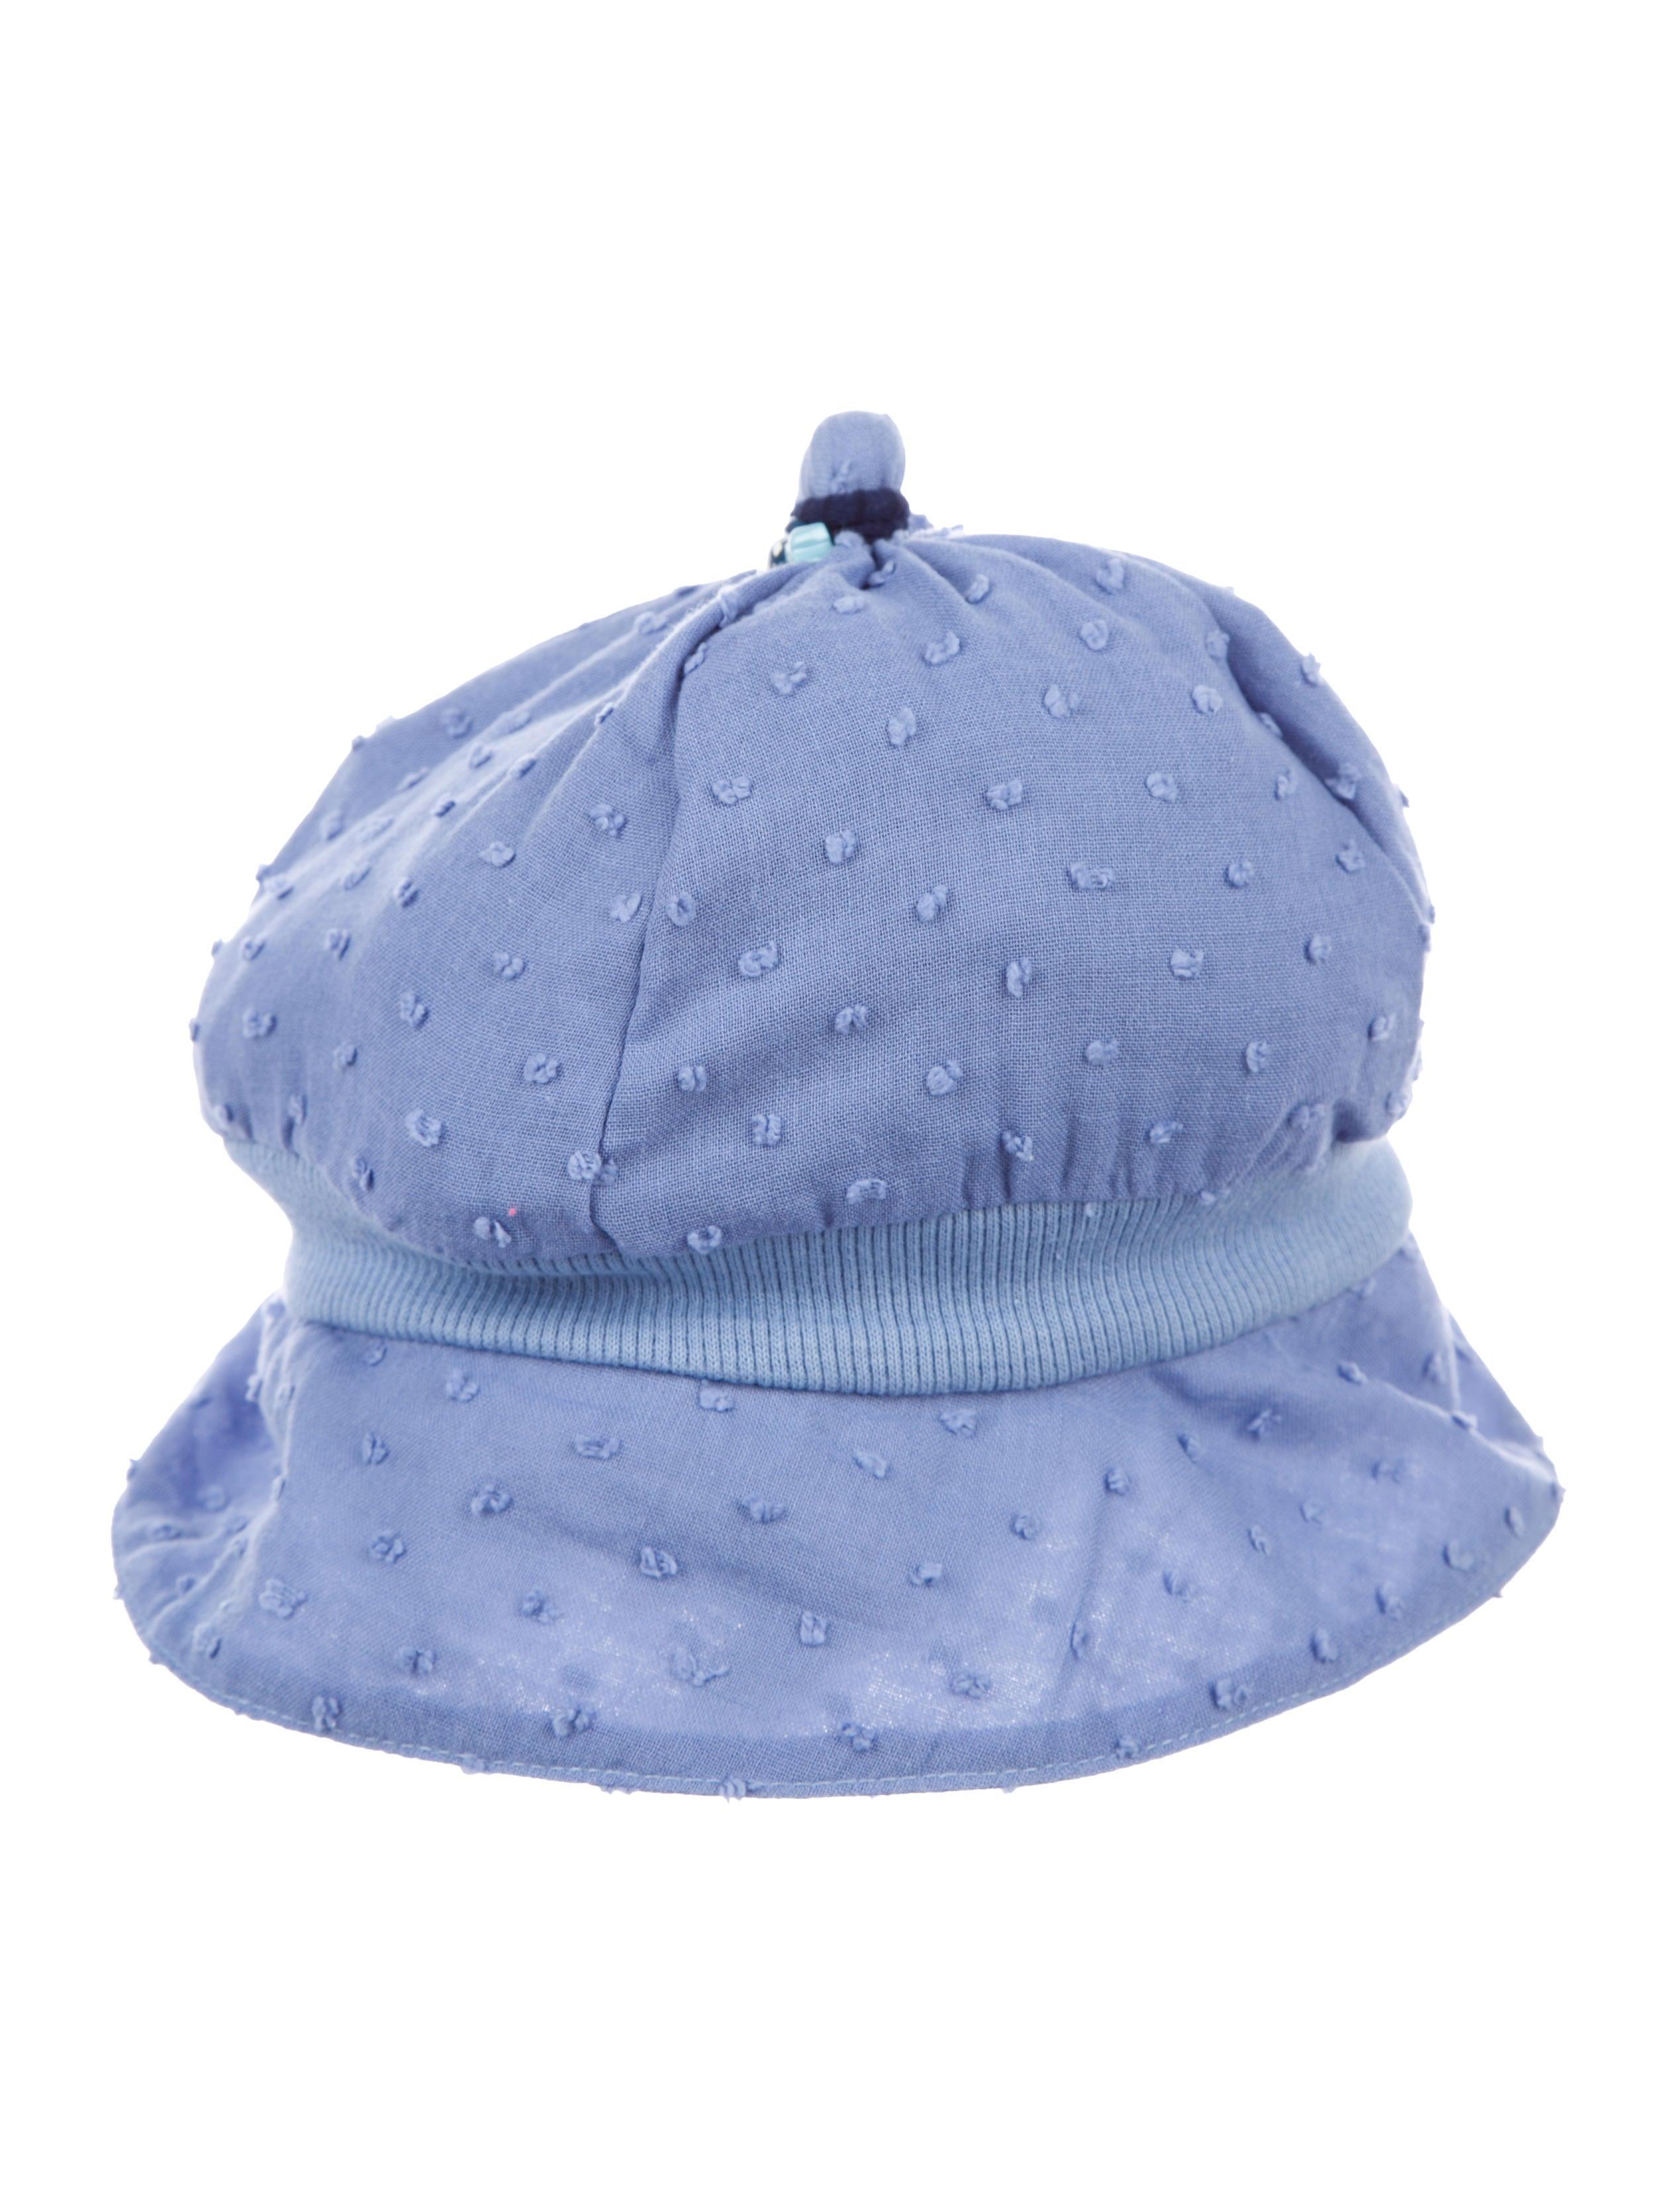 37114c99f8e Catimini Boys  Bucket Hat - Boys - WMINI20392